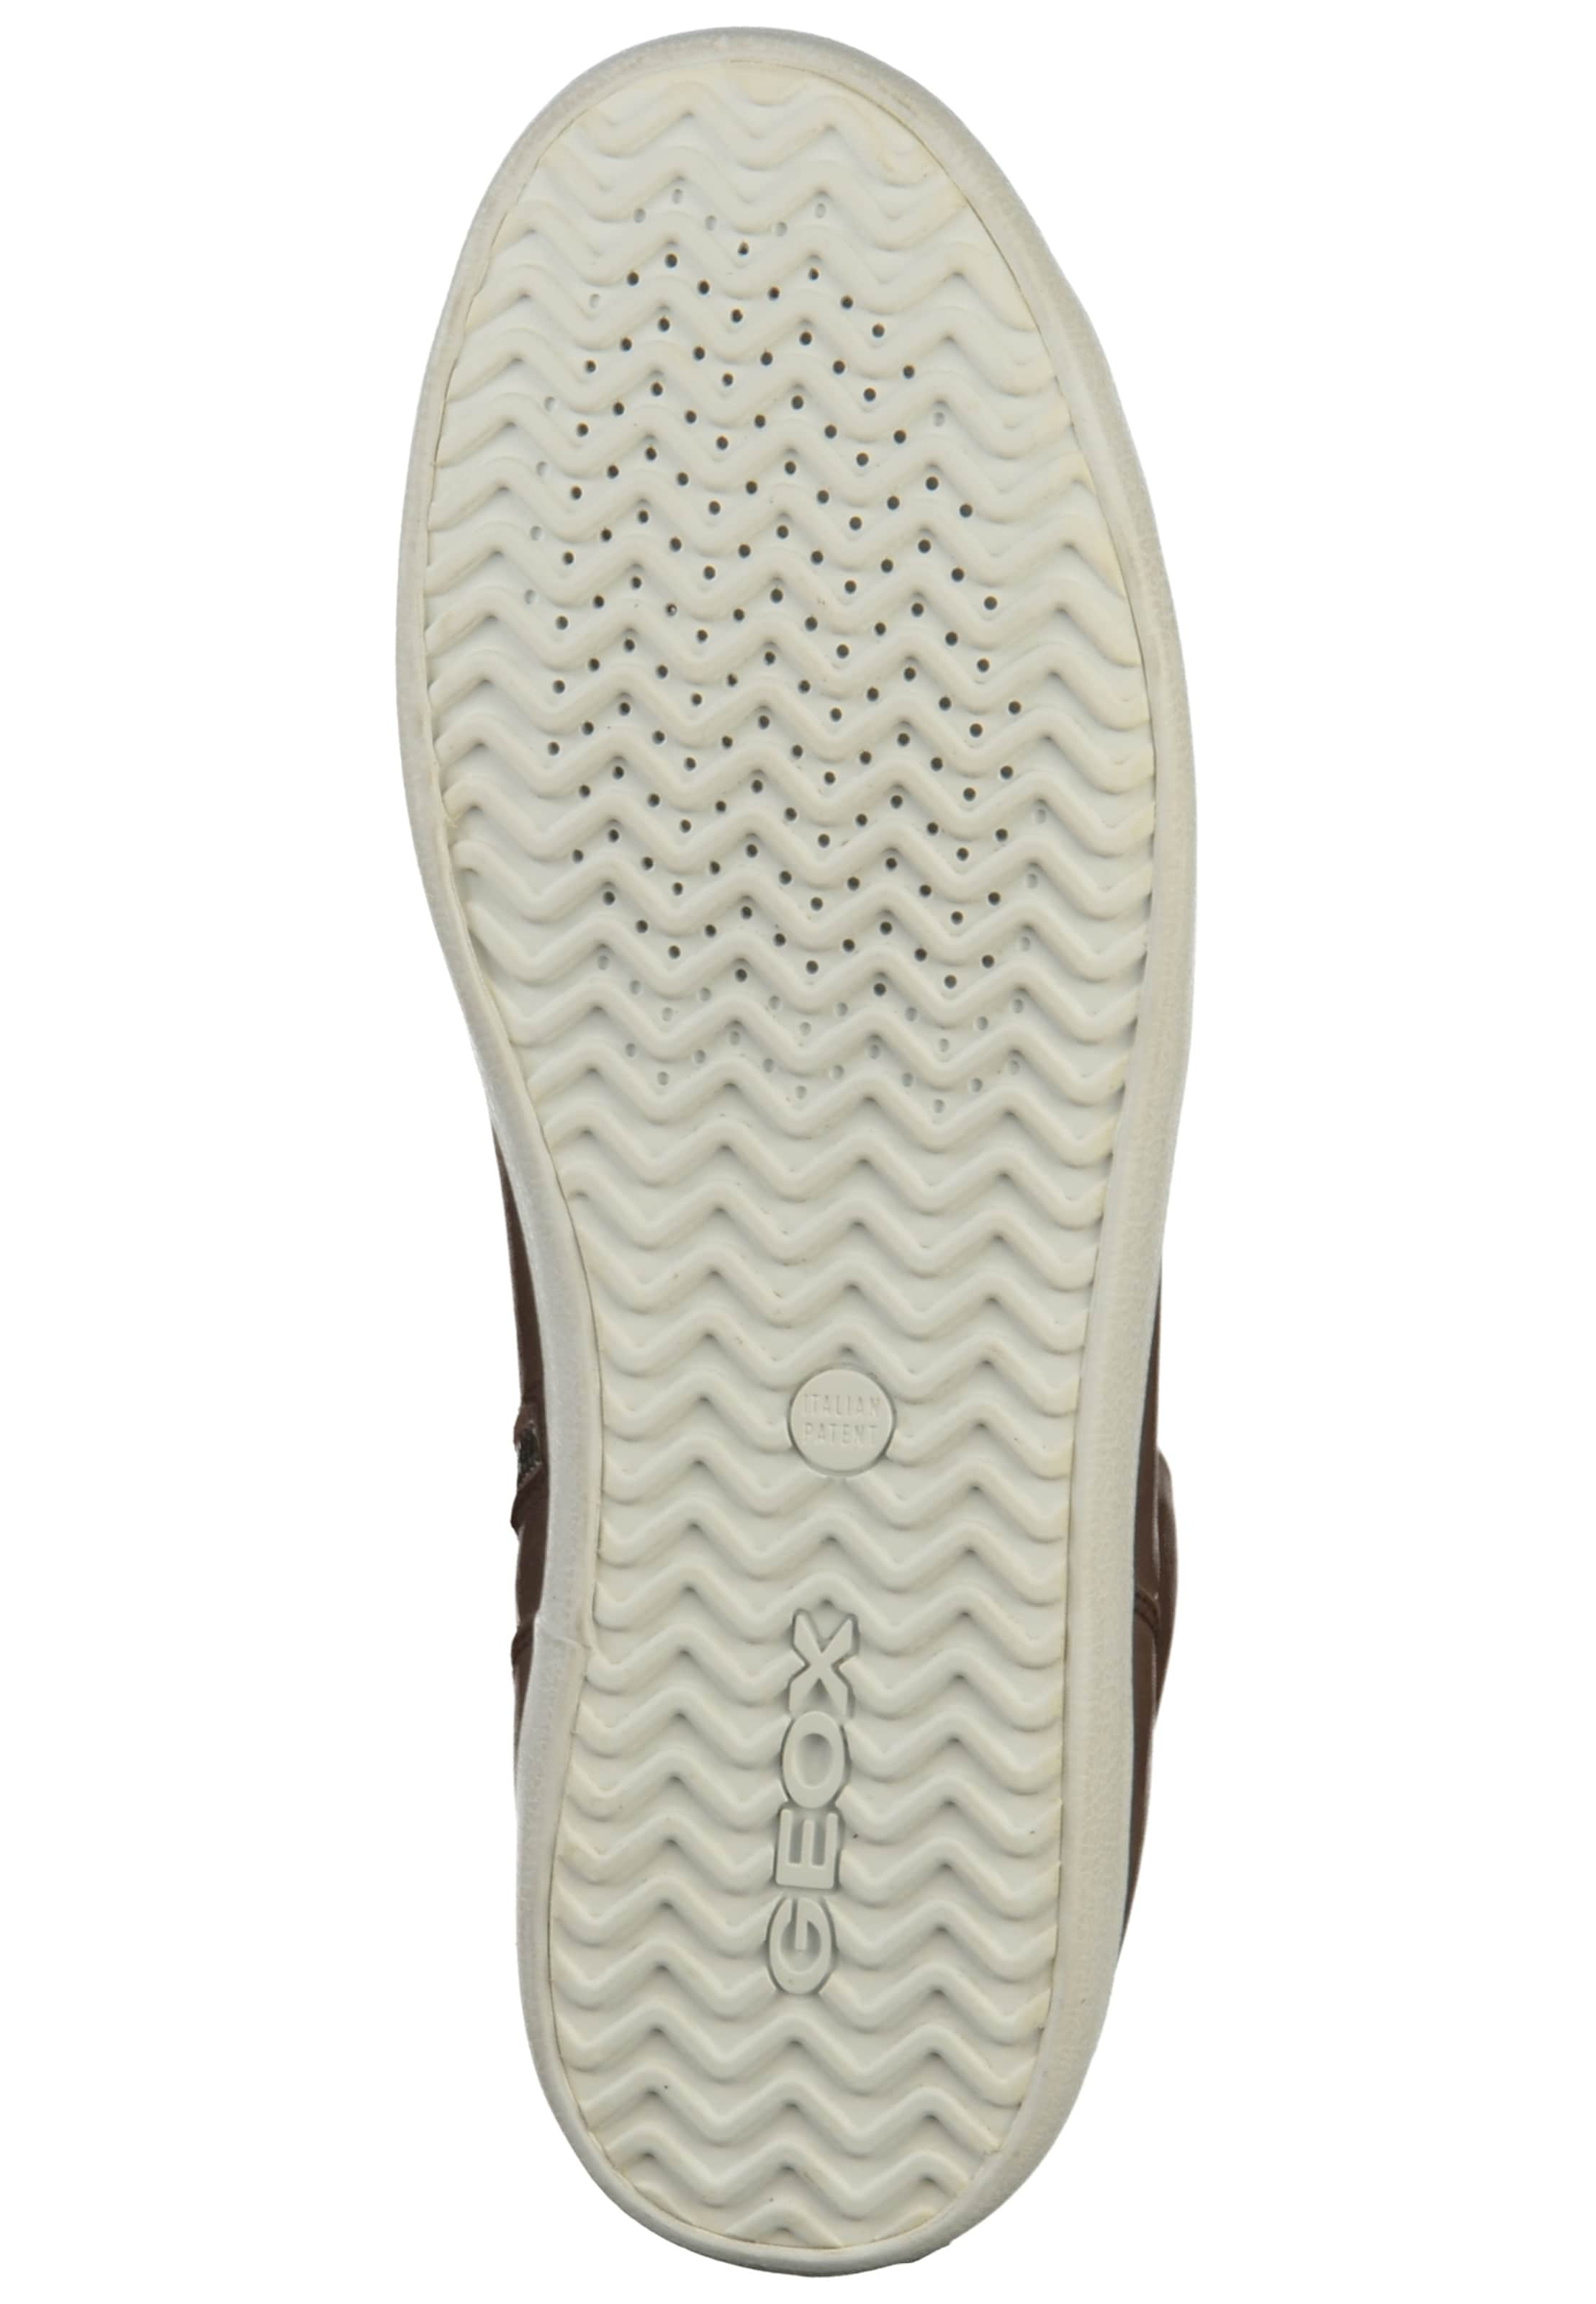 GEOX Sneakers hoog in Bruin / Natuurwit Leer 015401000150410